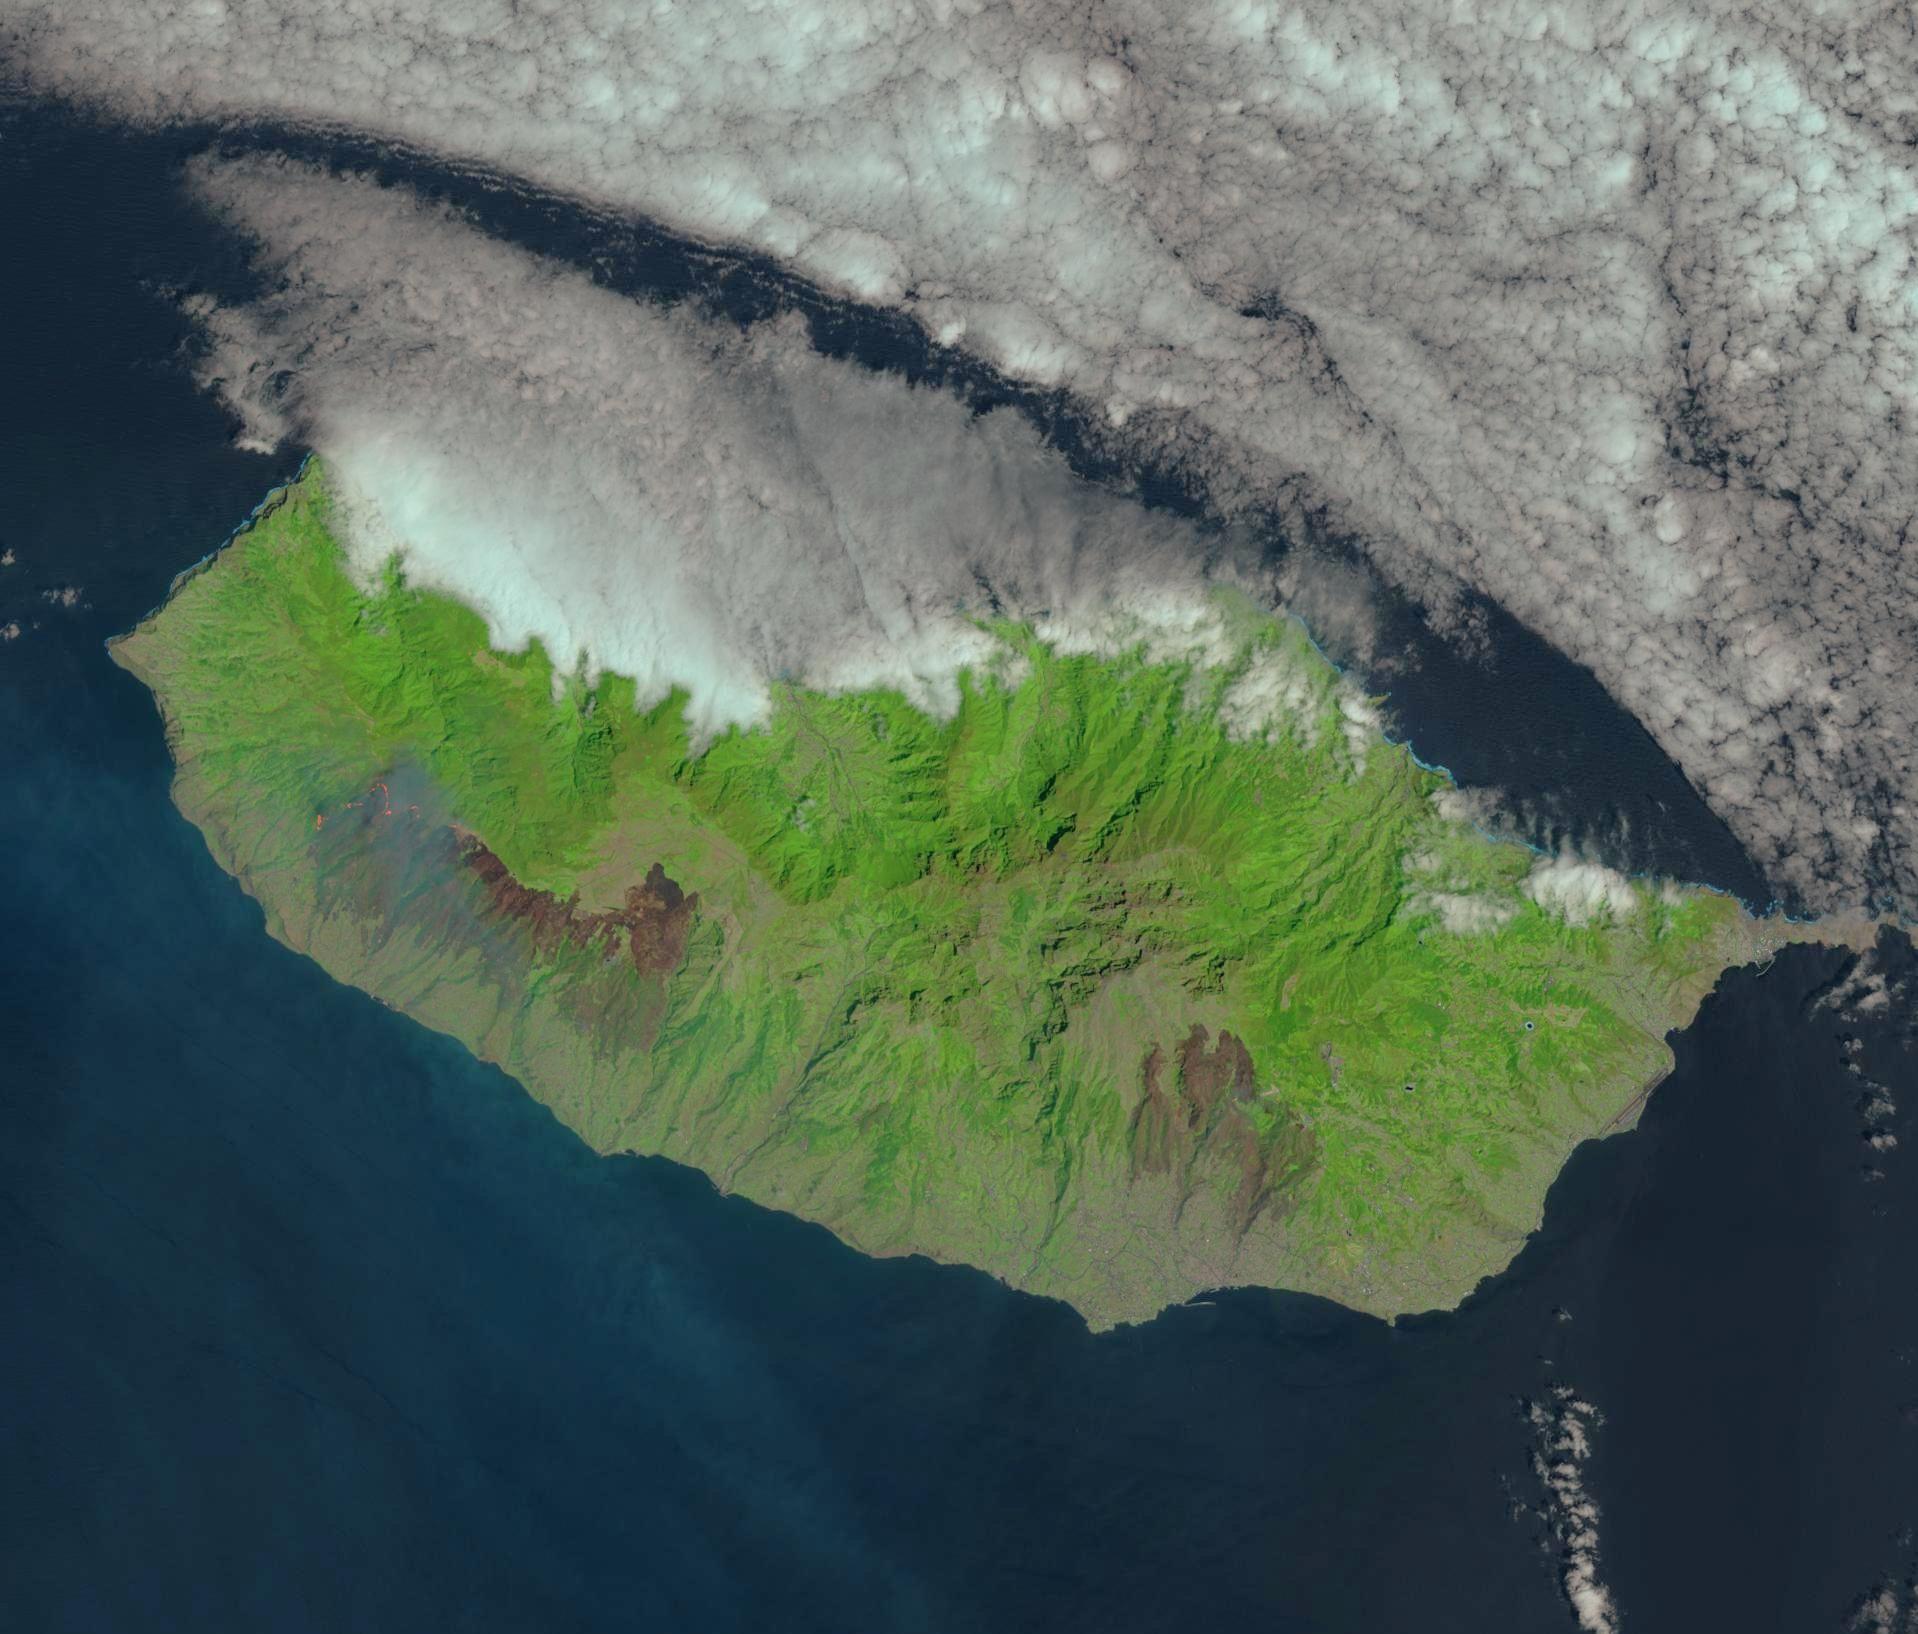 Incendies - île de Madère - Août 2016 - Madeira - Funchal - satellite - Landsat 8 - OLI - USGS